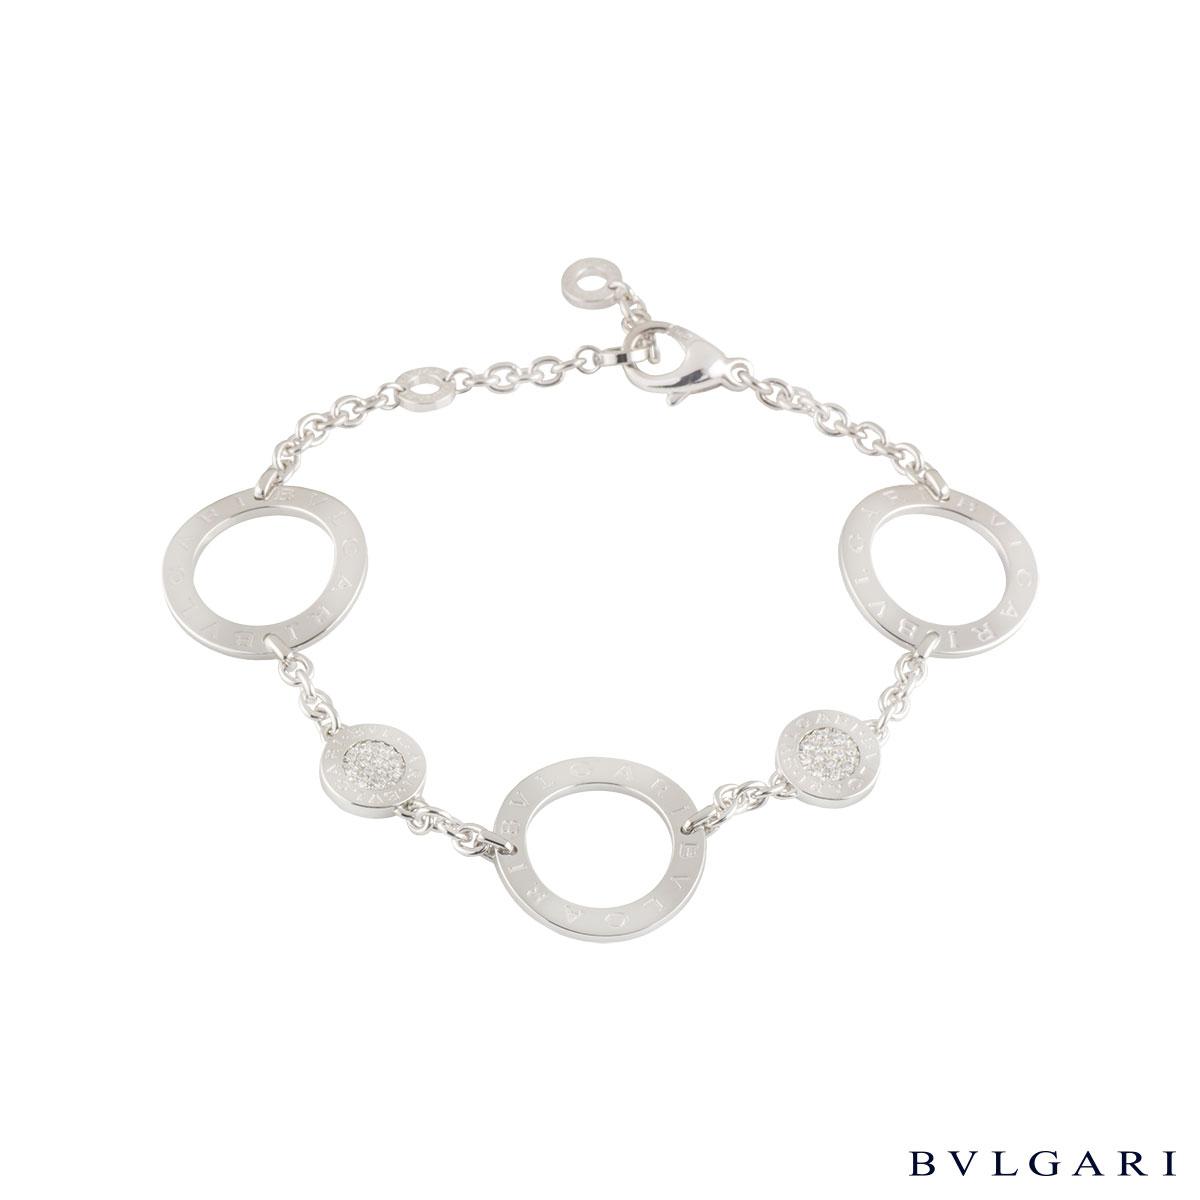 Bvlgari Bvlgari White Gold Diamond Bracelet